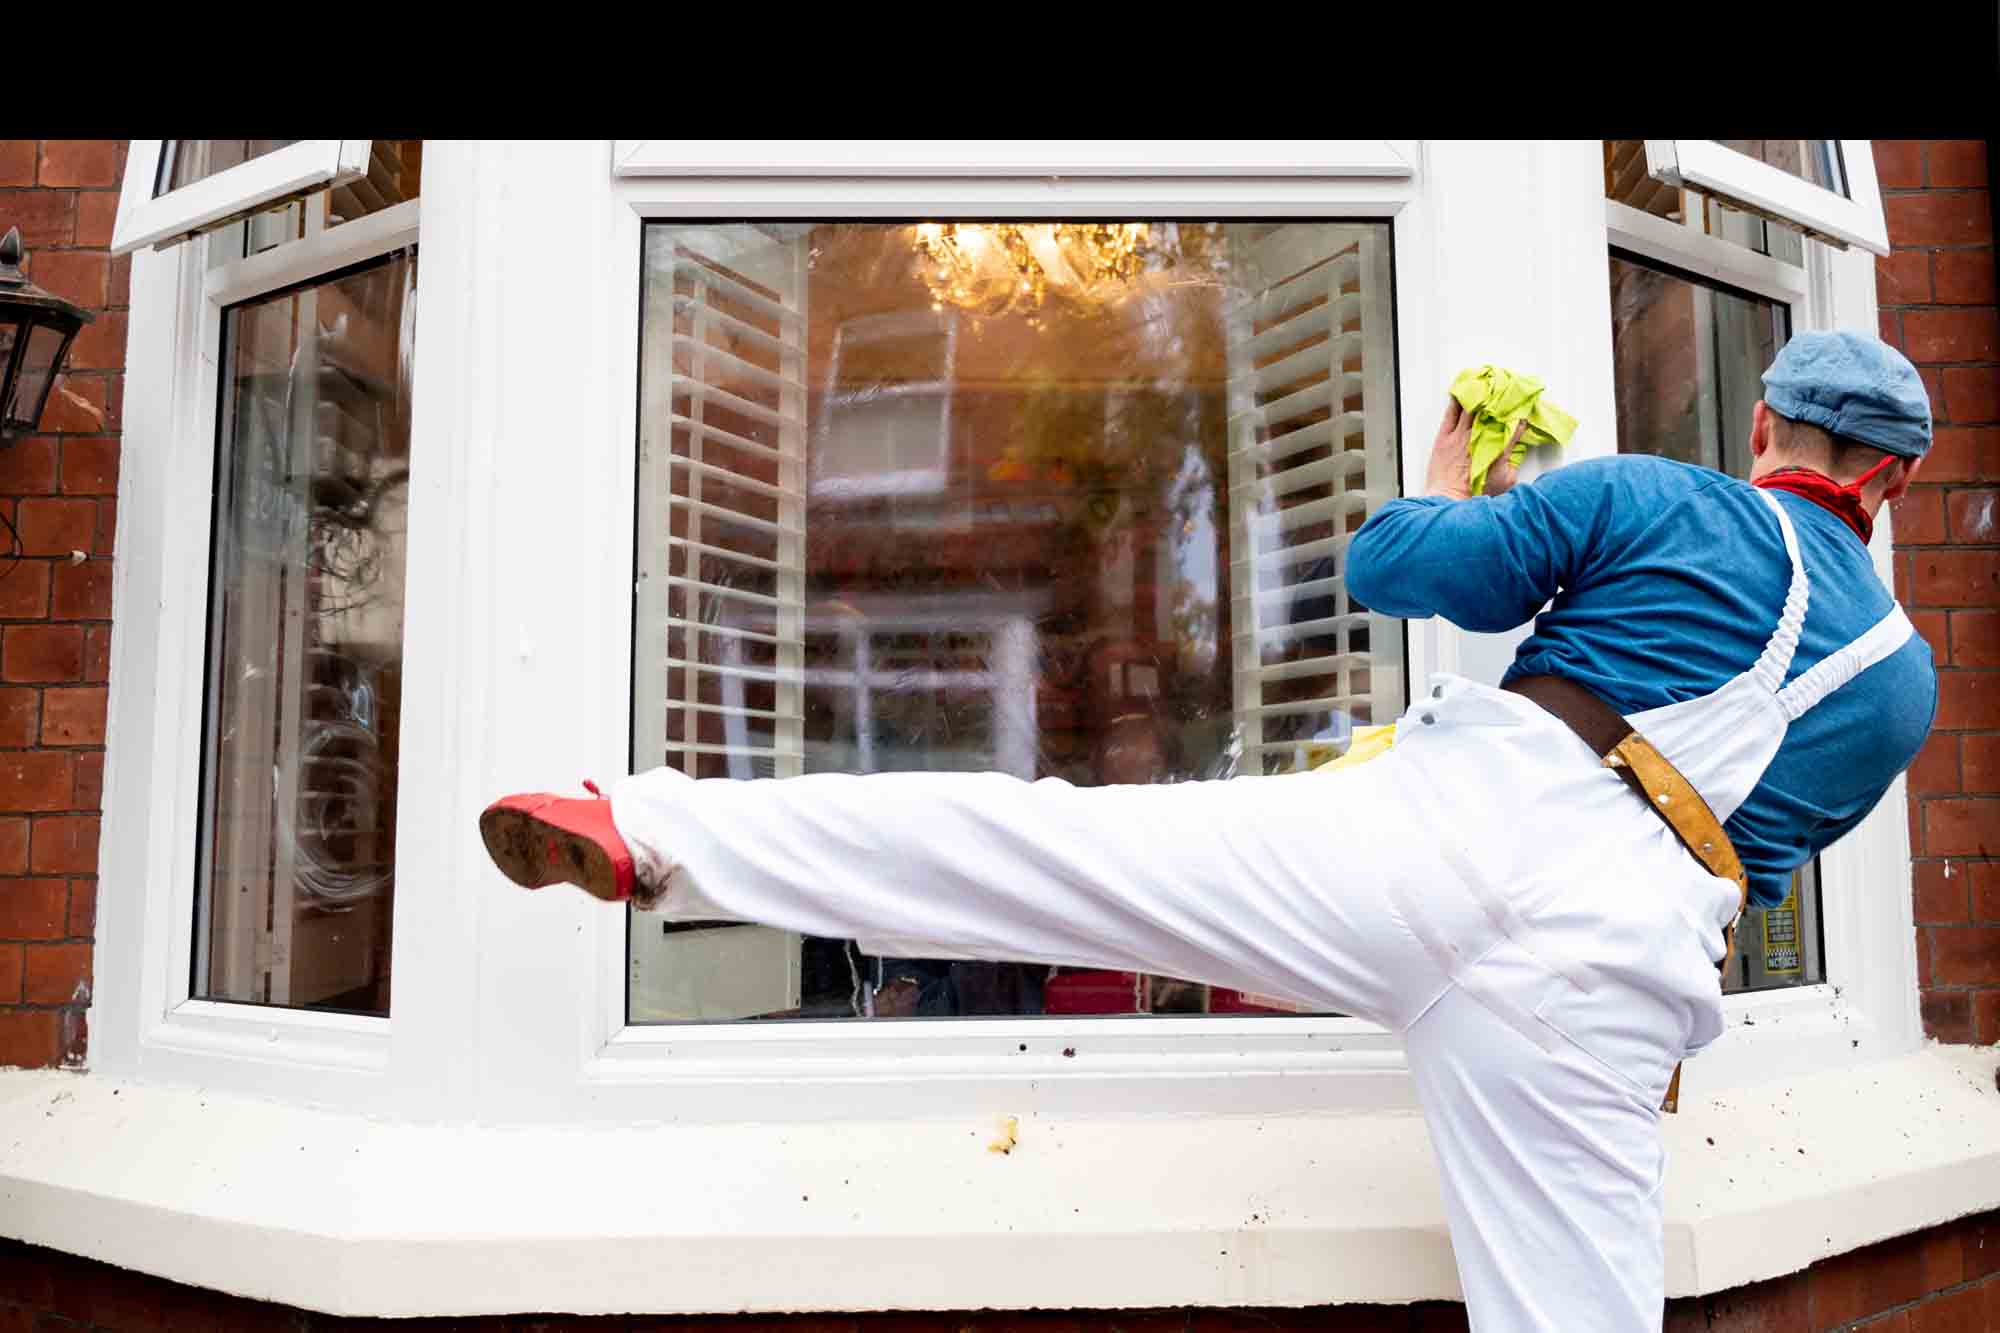 dancer at a window